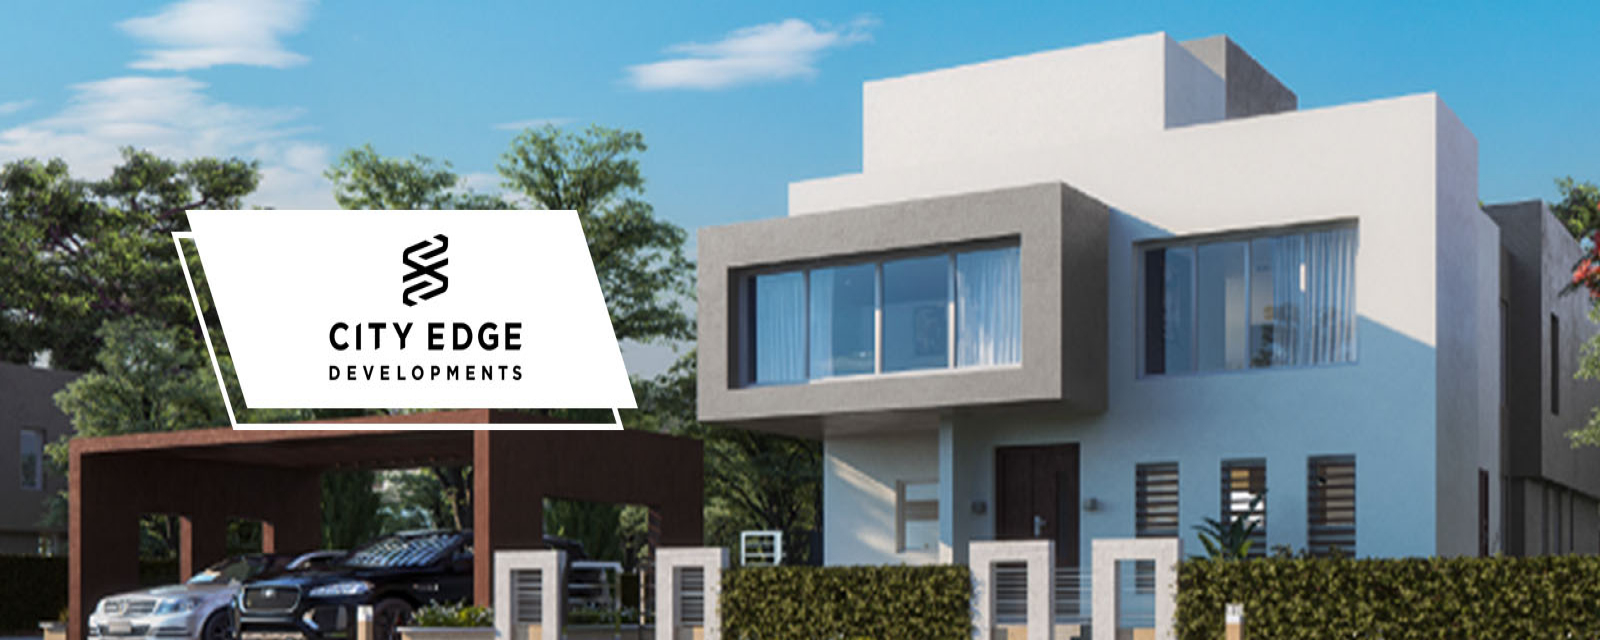 City Edge Developments Coverphoto Flash Property